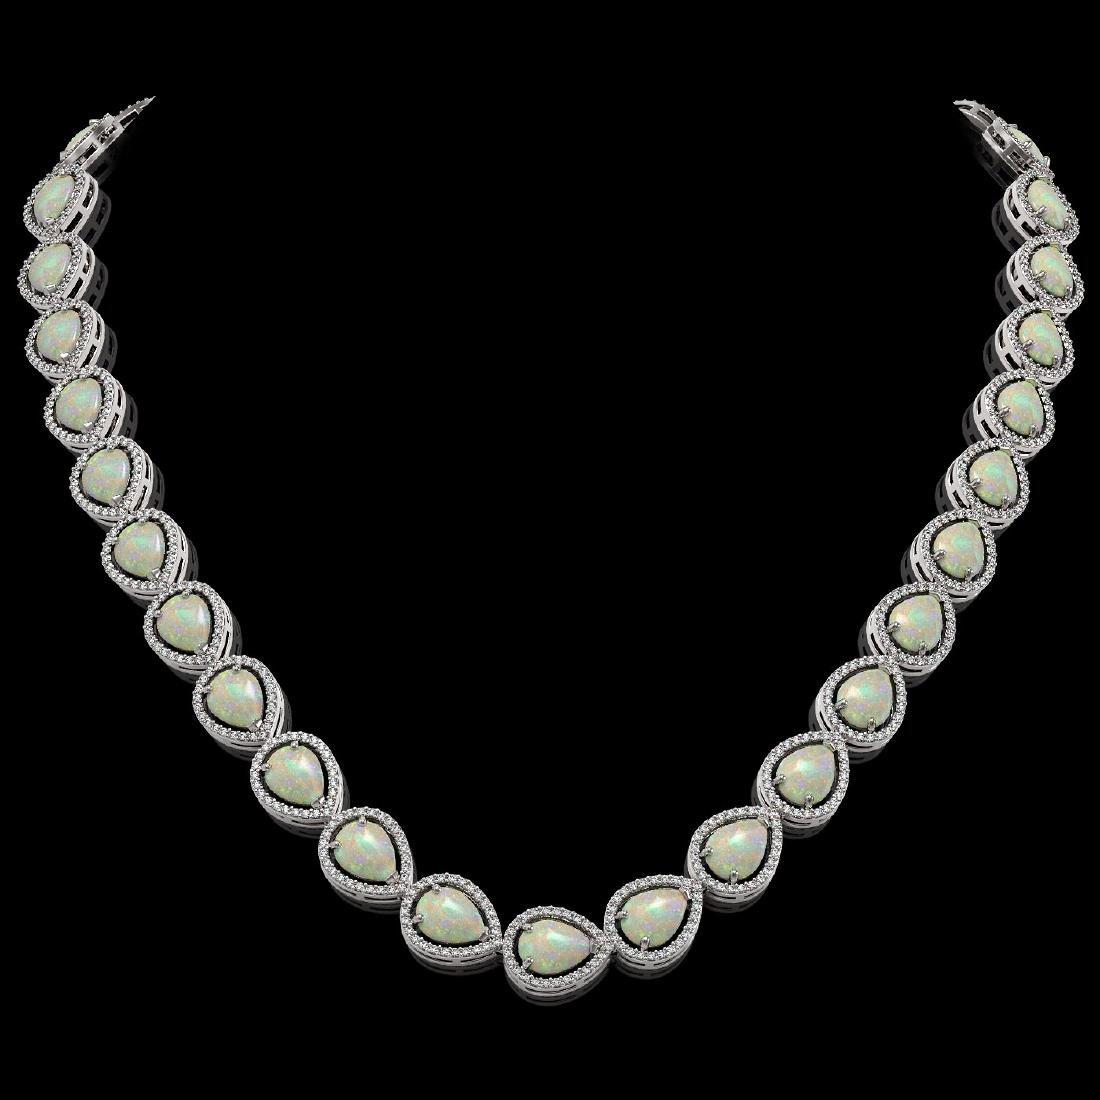 36.48 CTW Opal & Diamond Halo Necklace 10K White Gold